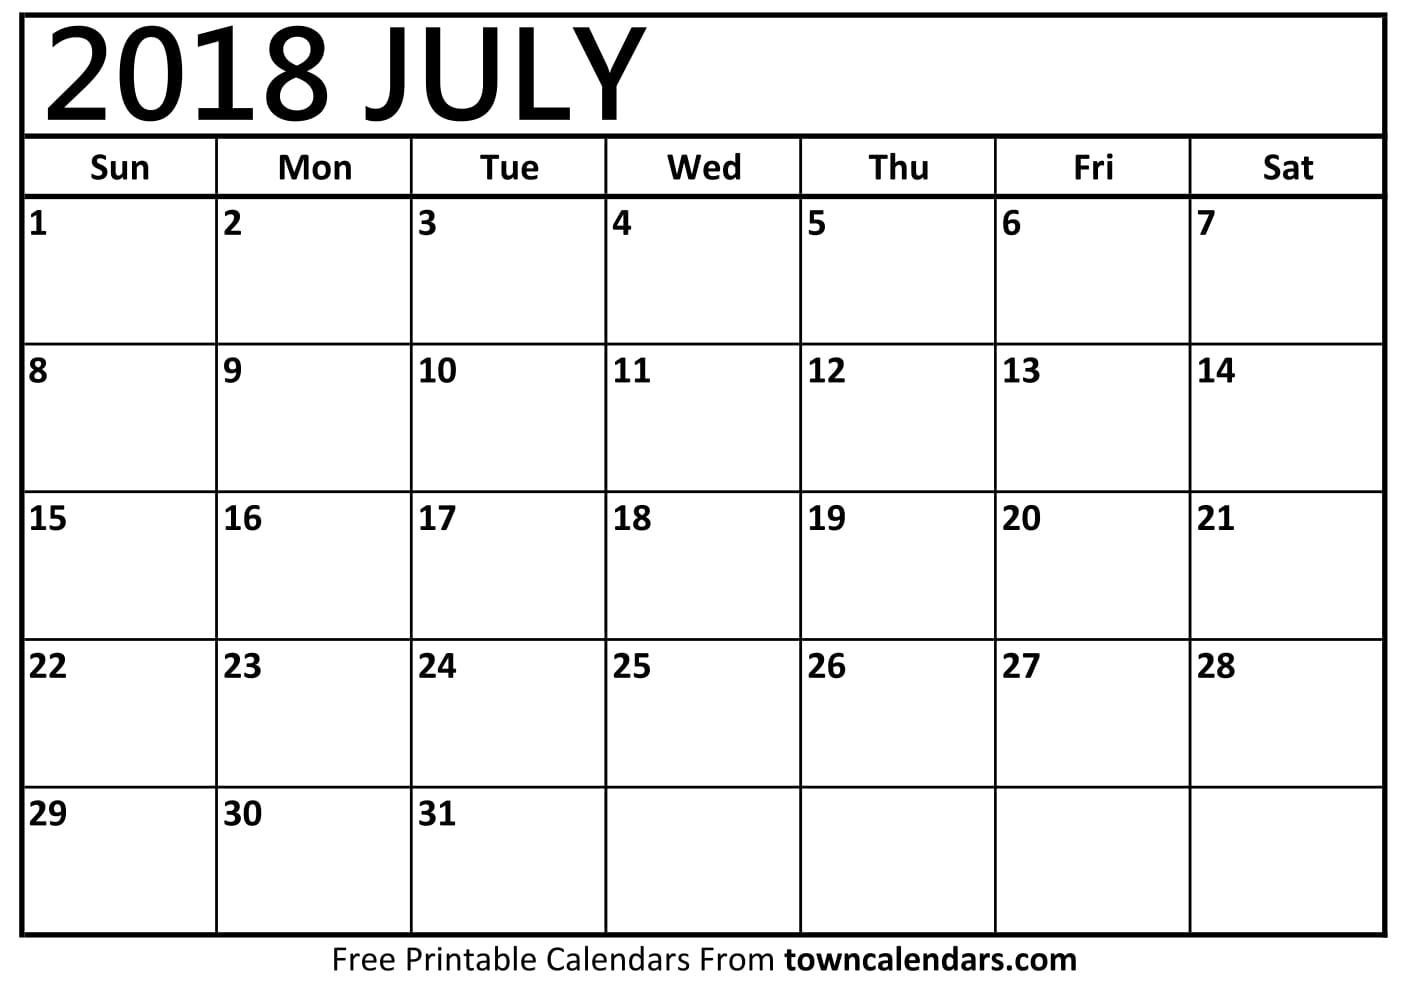 july 2018 calendar July 2018 canadian calendar july 2018 calendar